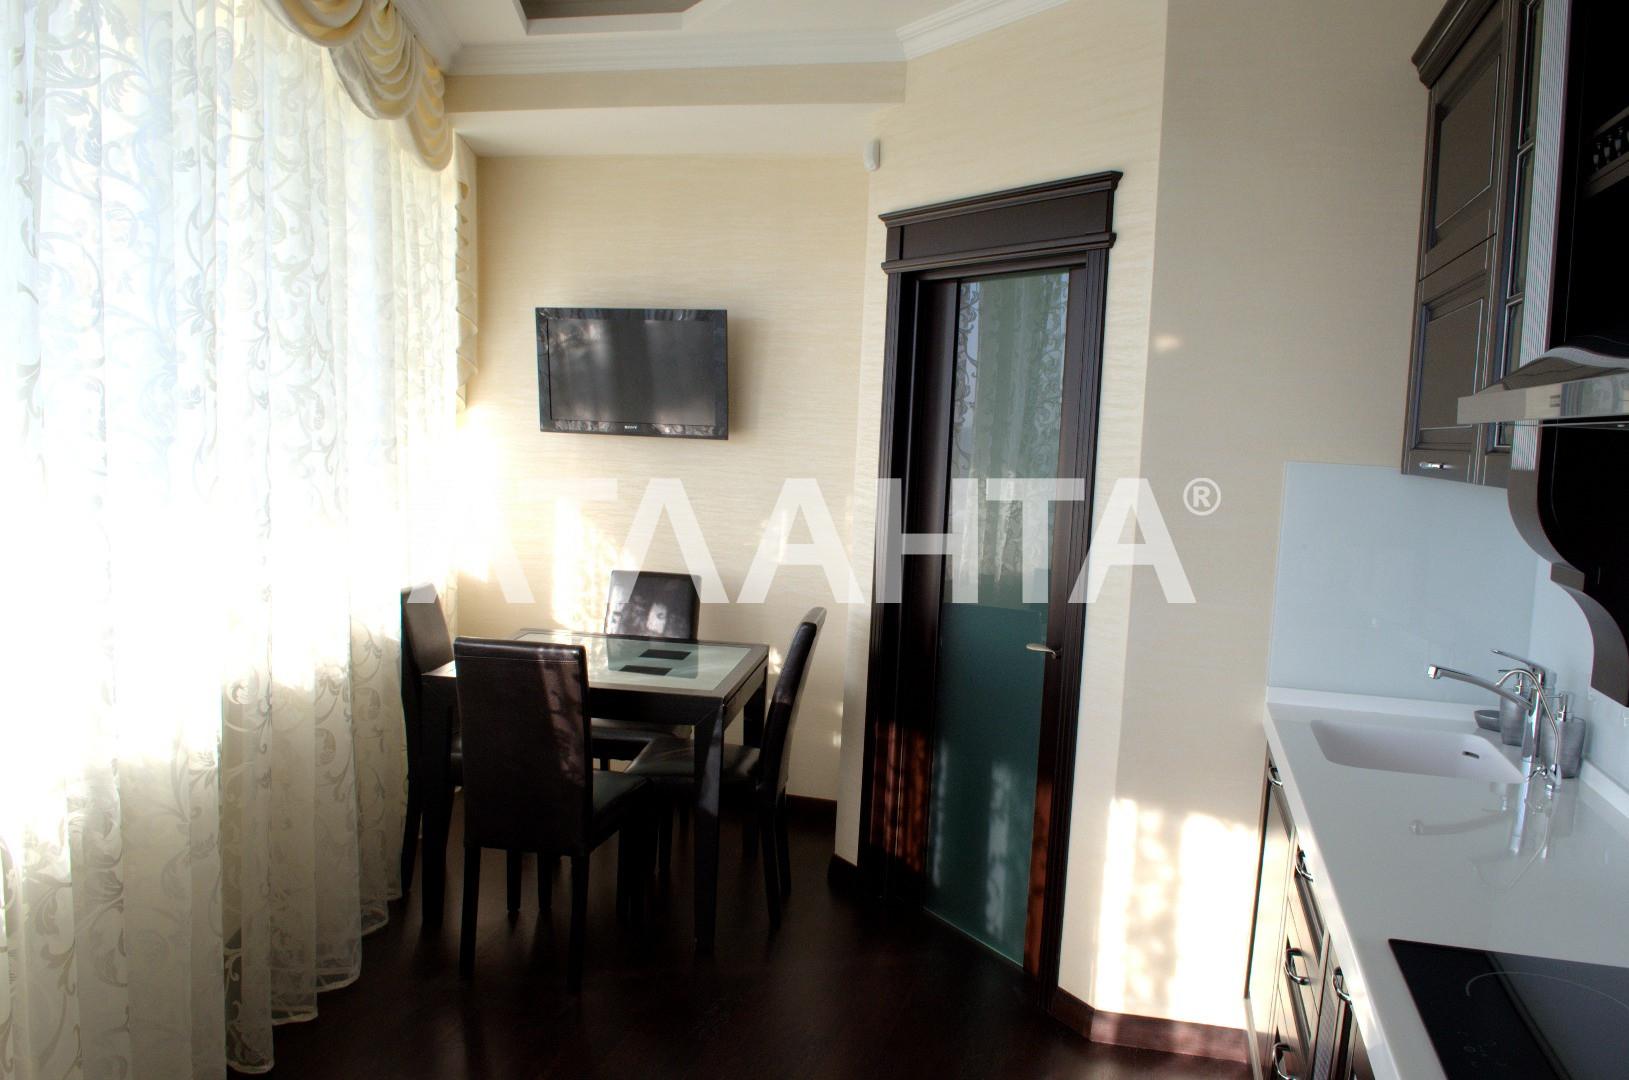 Продается 4-комнатная Квартира на ул. Французский Бул. (Пролетарский Бул.) — 350 000 у.е. (фото №9)